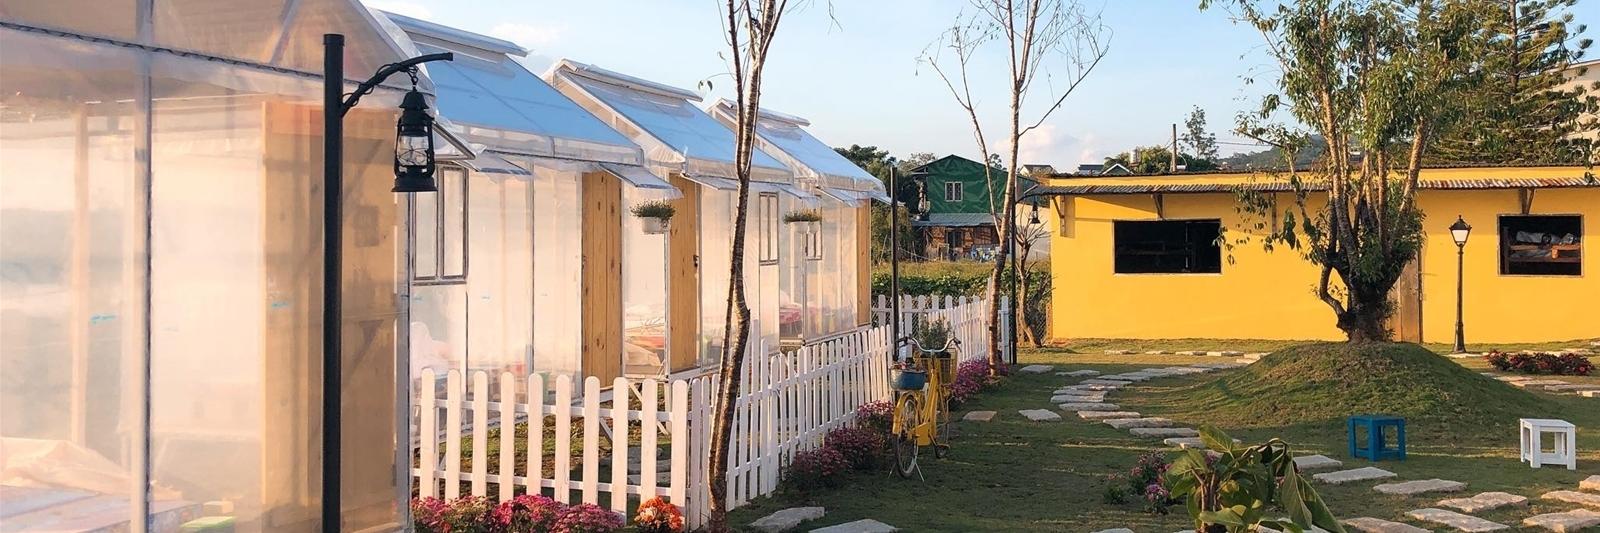 https://gody.vn/blog/review-homestay-hostel-resort/post/5-homestay-o-da-lat-cuc-lang-man-dac-biet-danh-rieng-cho-cac-cap-doi-1097